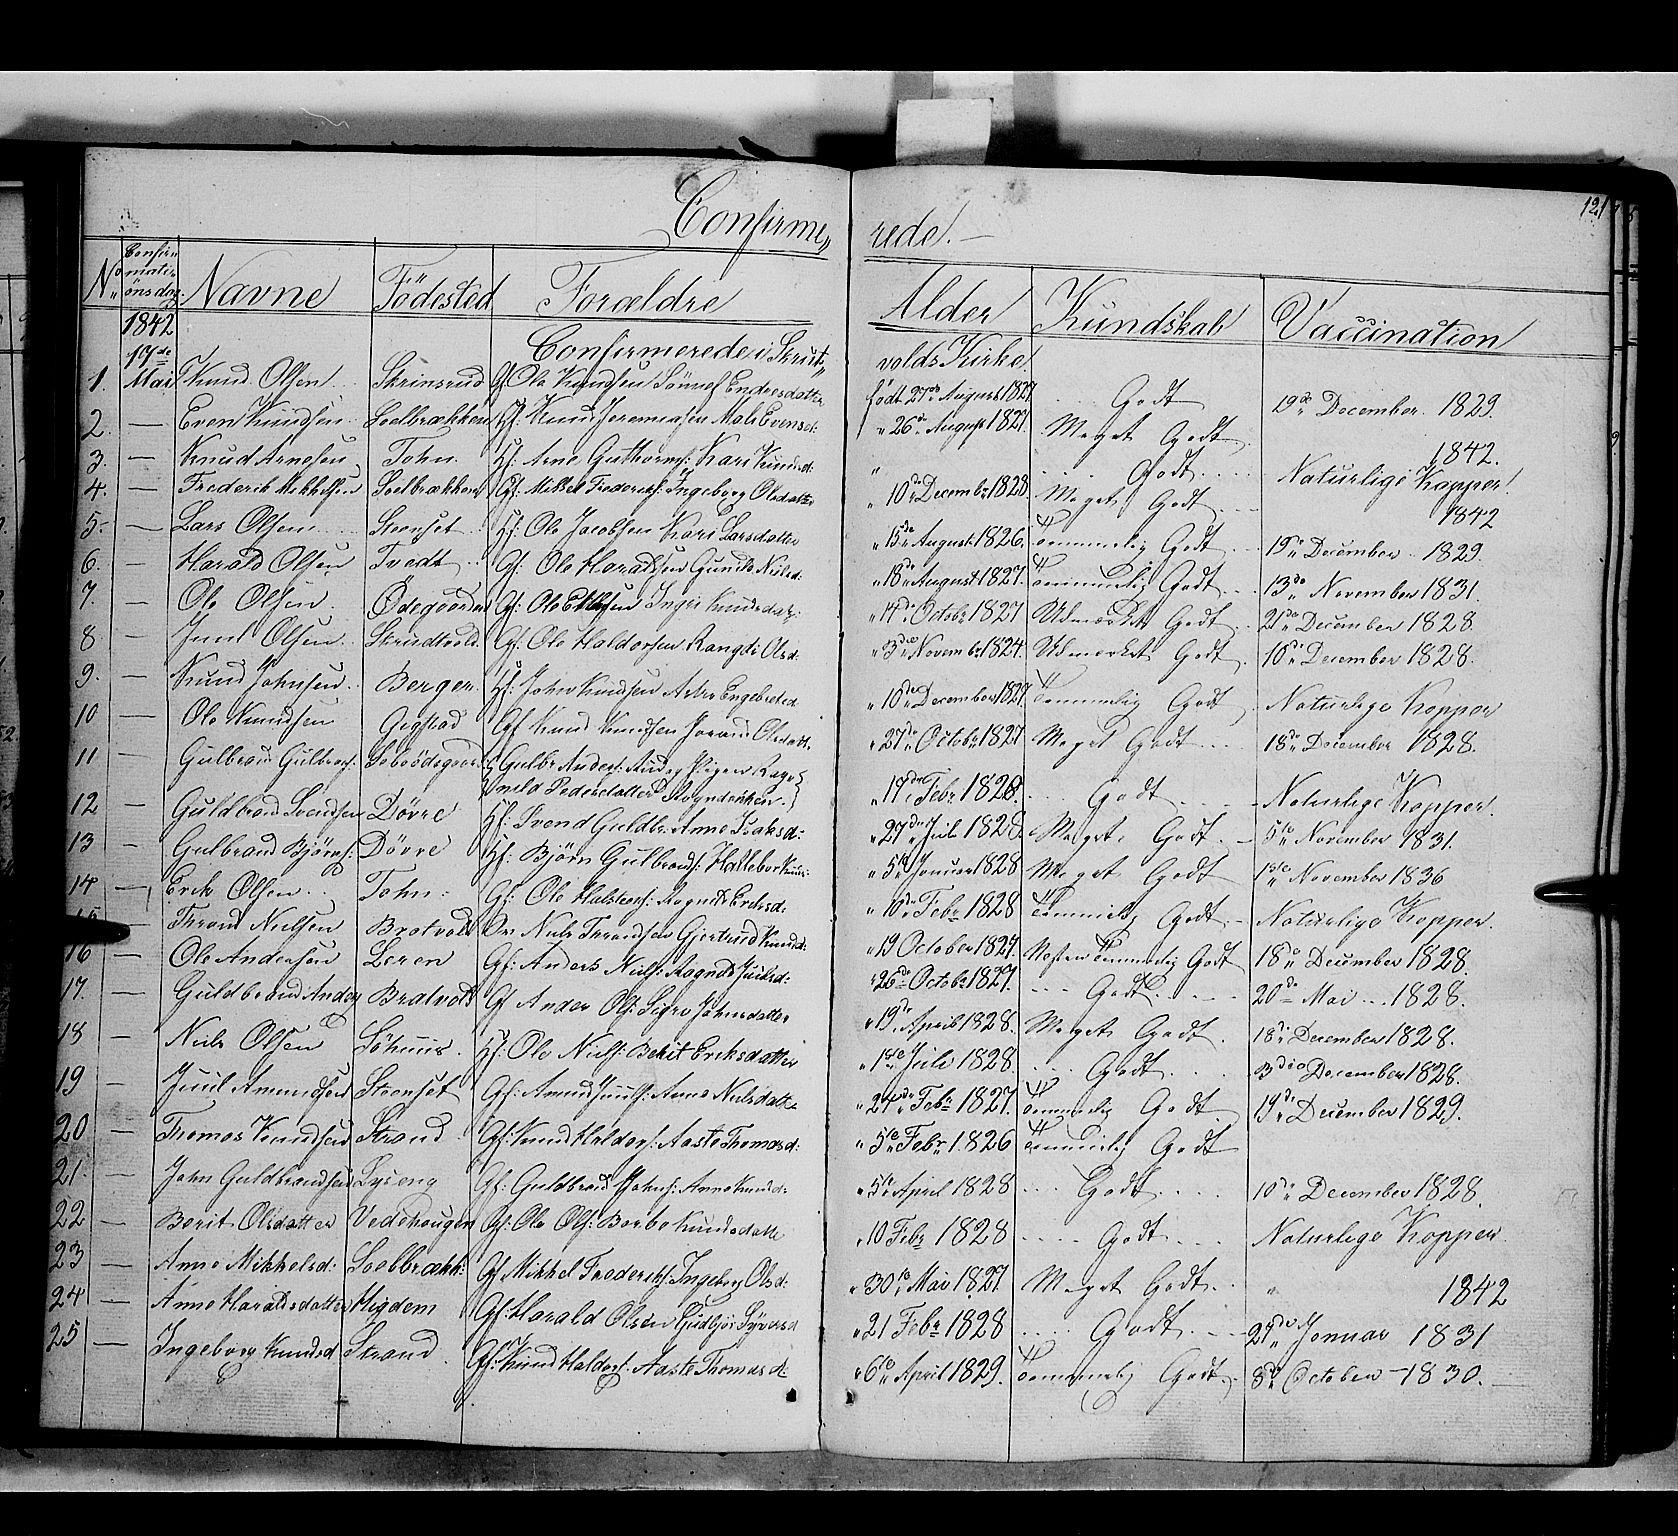 SAH, Nord-Aurdal prestekontor, Ministerialbok nr. 7, 1842-1863, s. 121